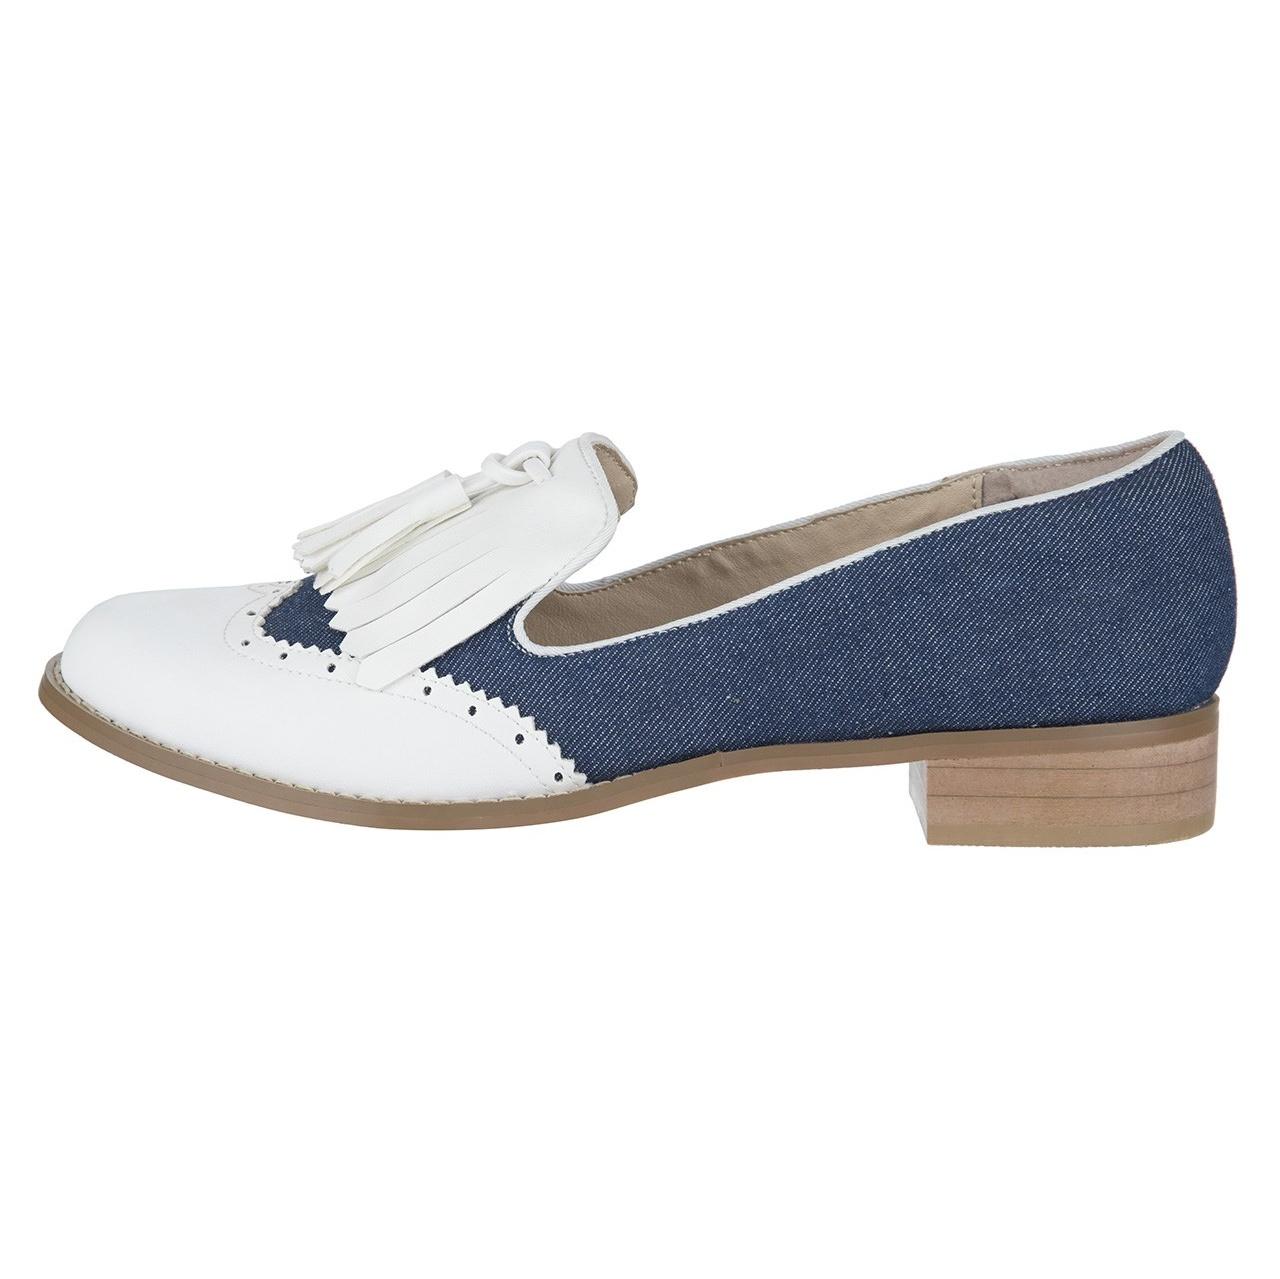 کفش زنانه ایزان کالاس مدل Tassel 400